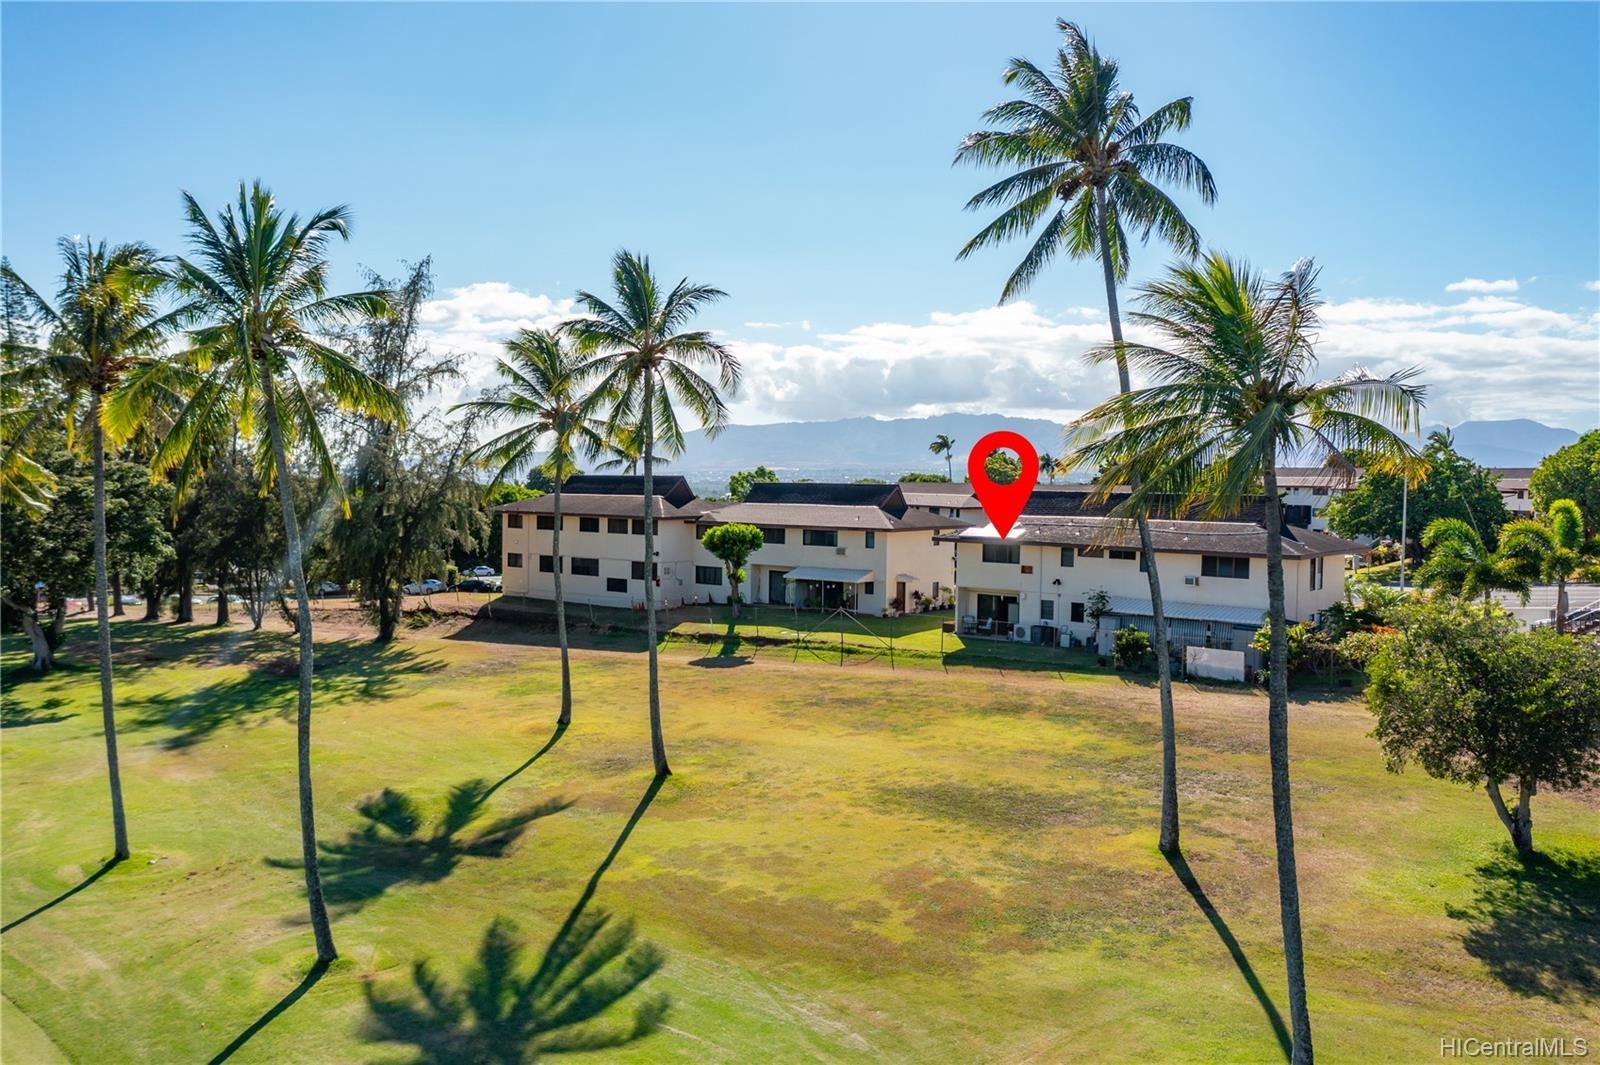 98-405 Kaonohi Street townhouse # 24/2, Aiea, Hawaii - photo 23 of 24